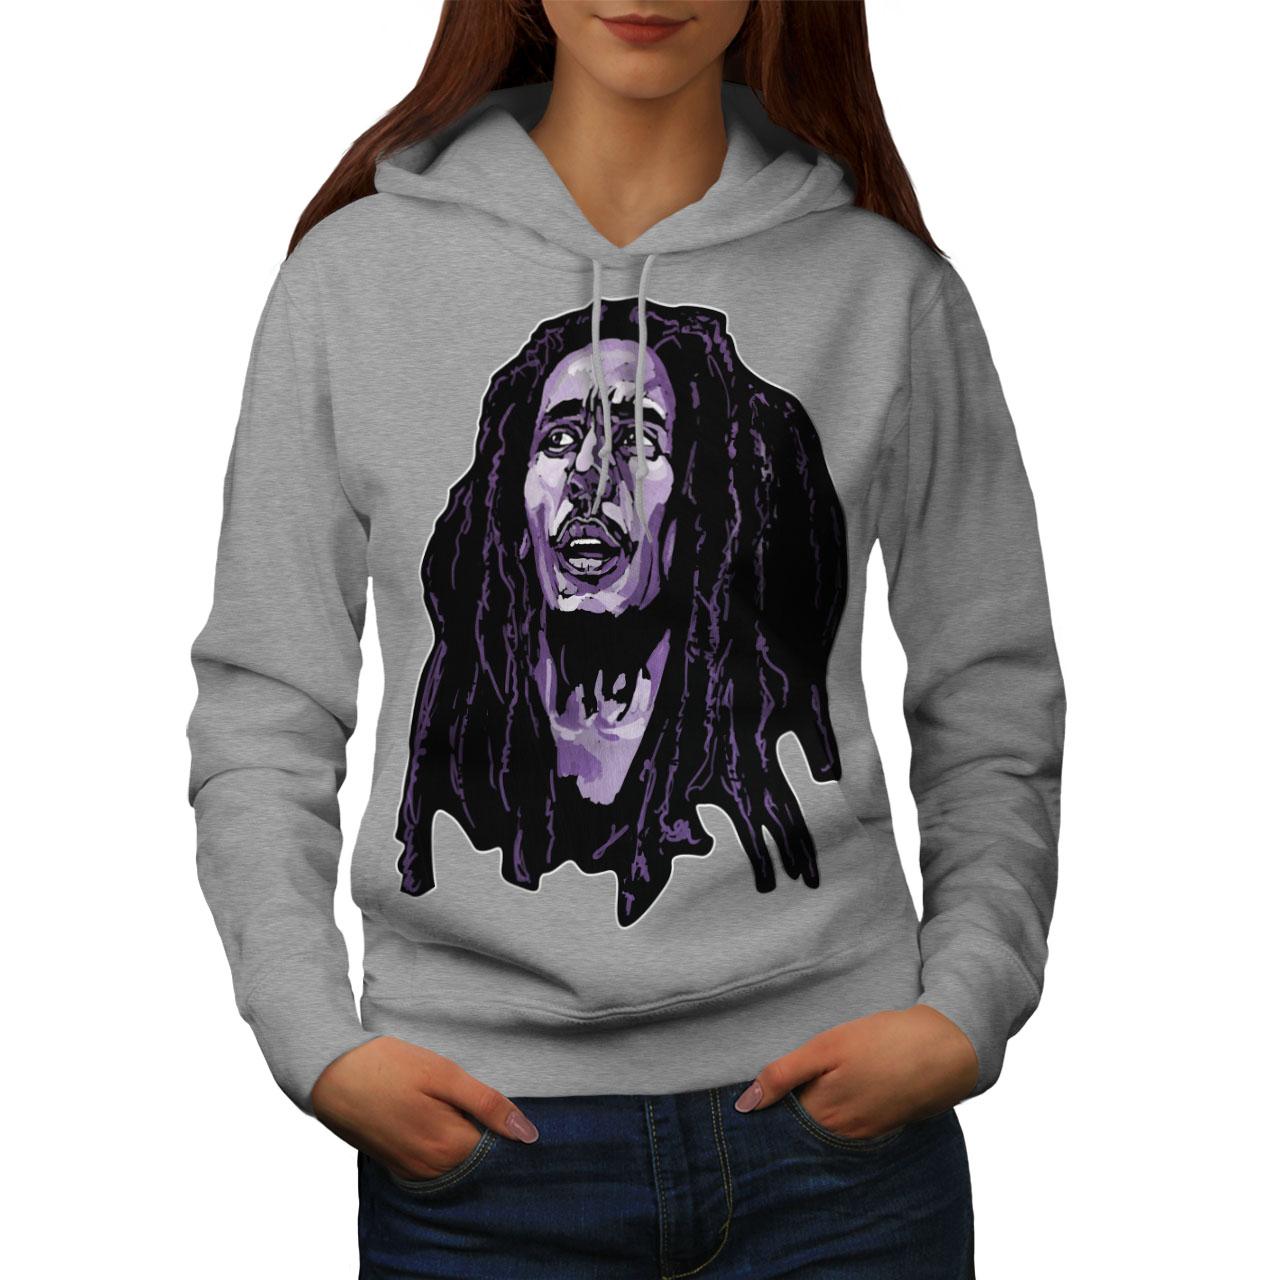 No Casual Hooded Sweatshirt Wellcoda Rasta Legend Celebrity Womens Hoodie